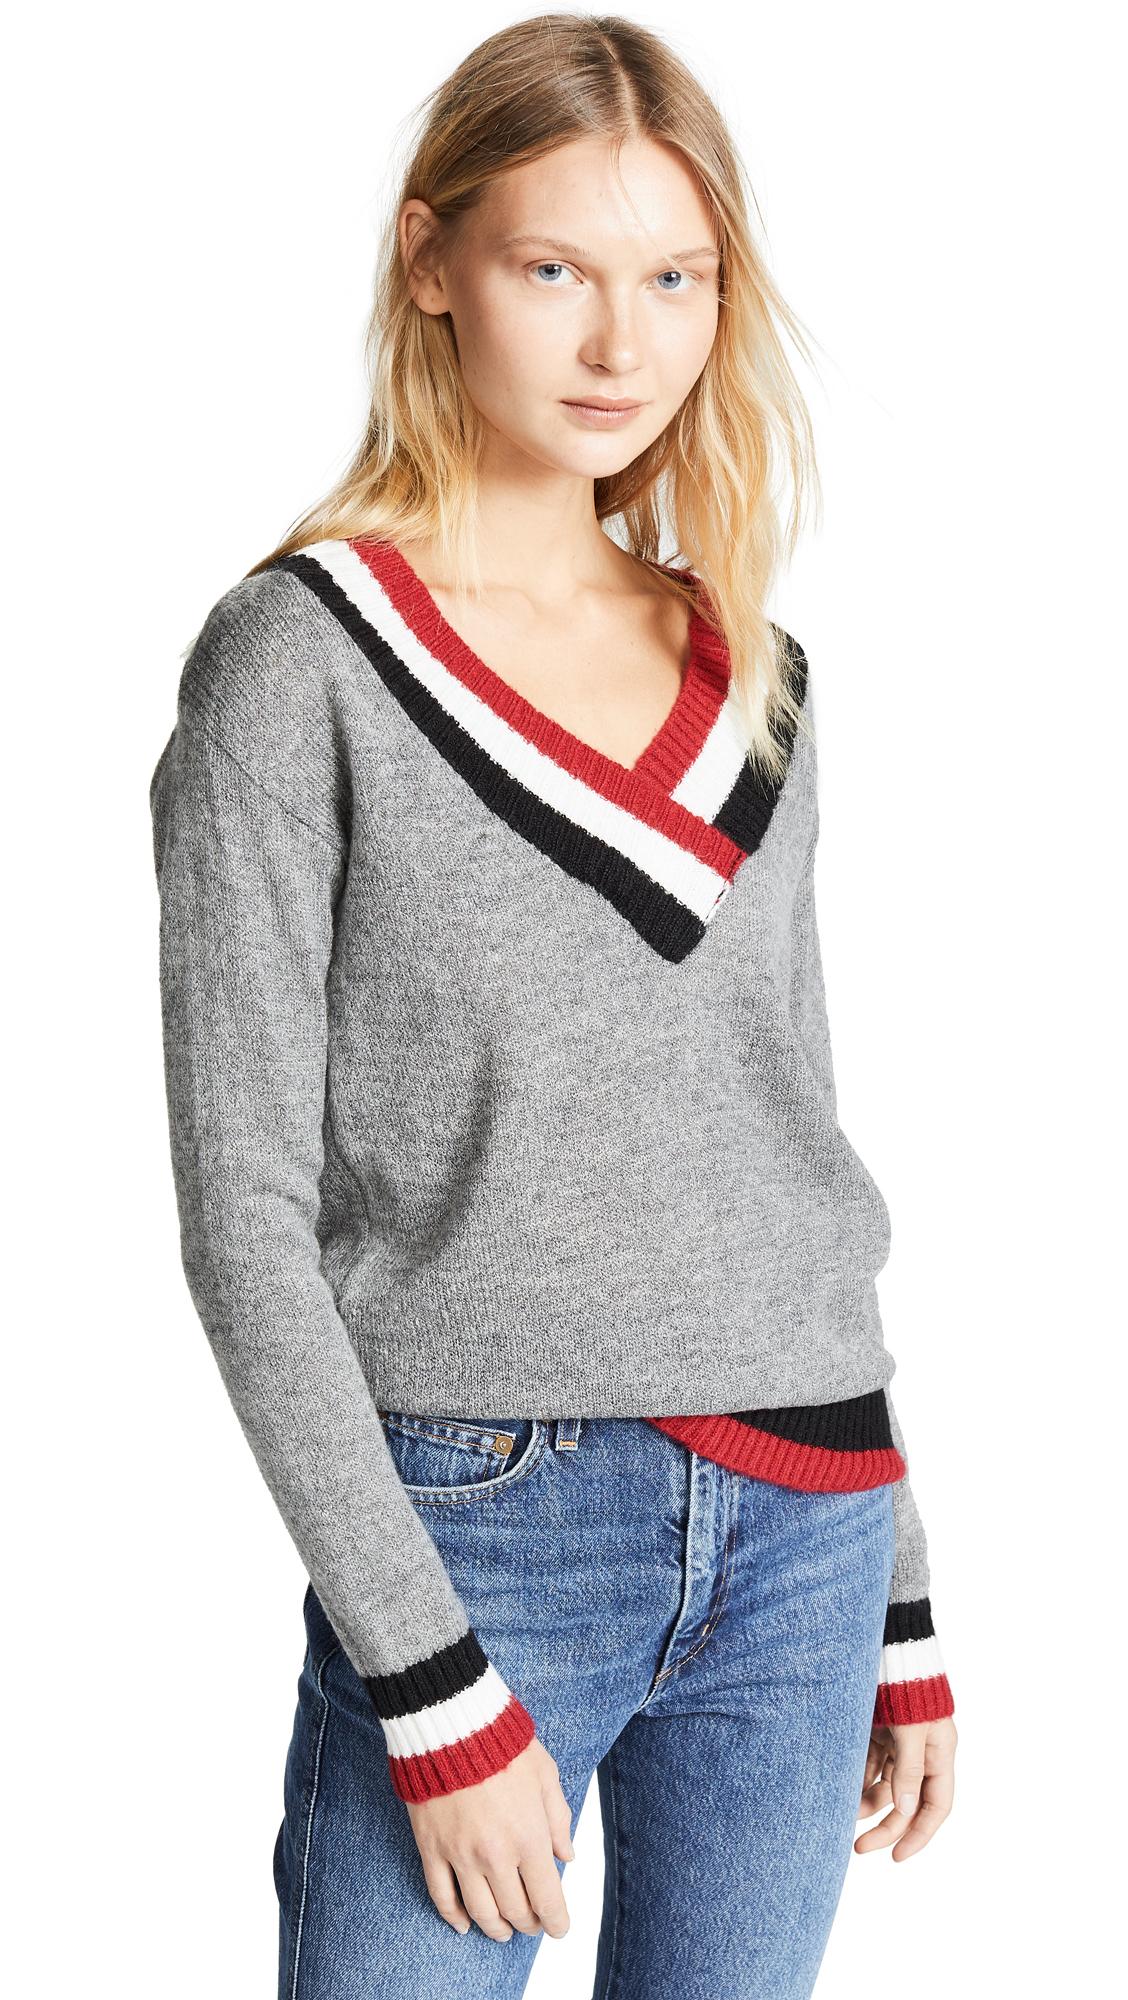 Rebecca Minkoff Fin Sweater - Heather Grey